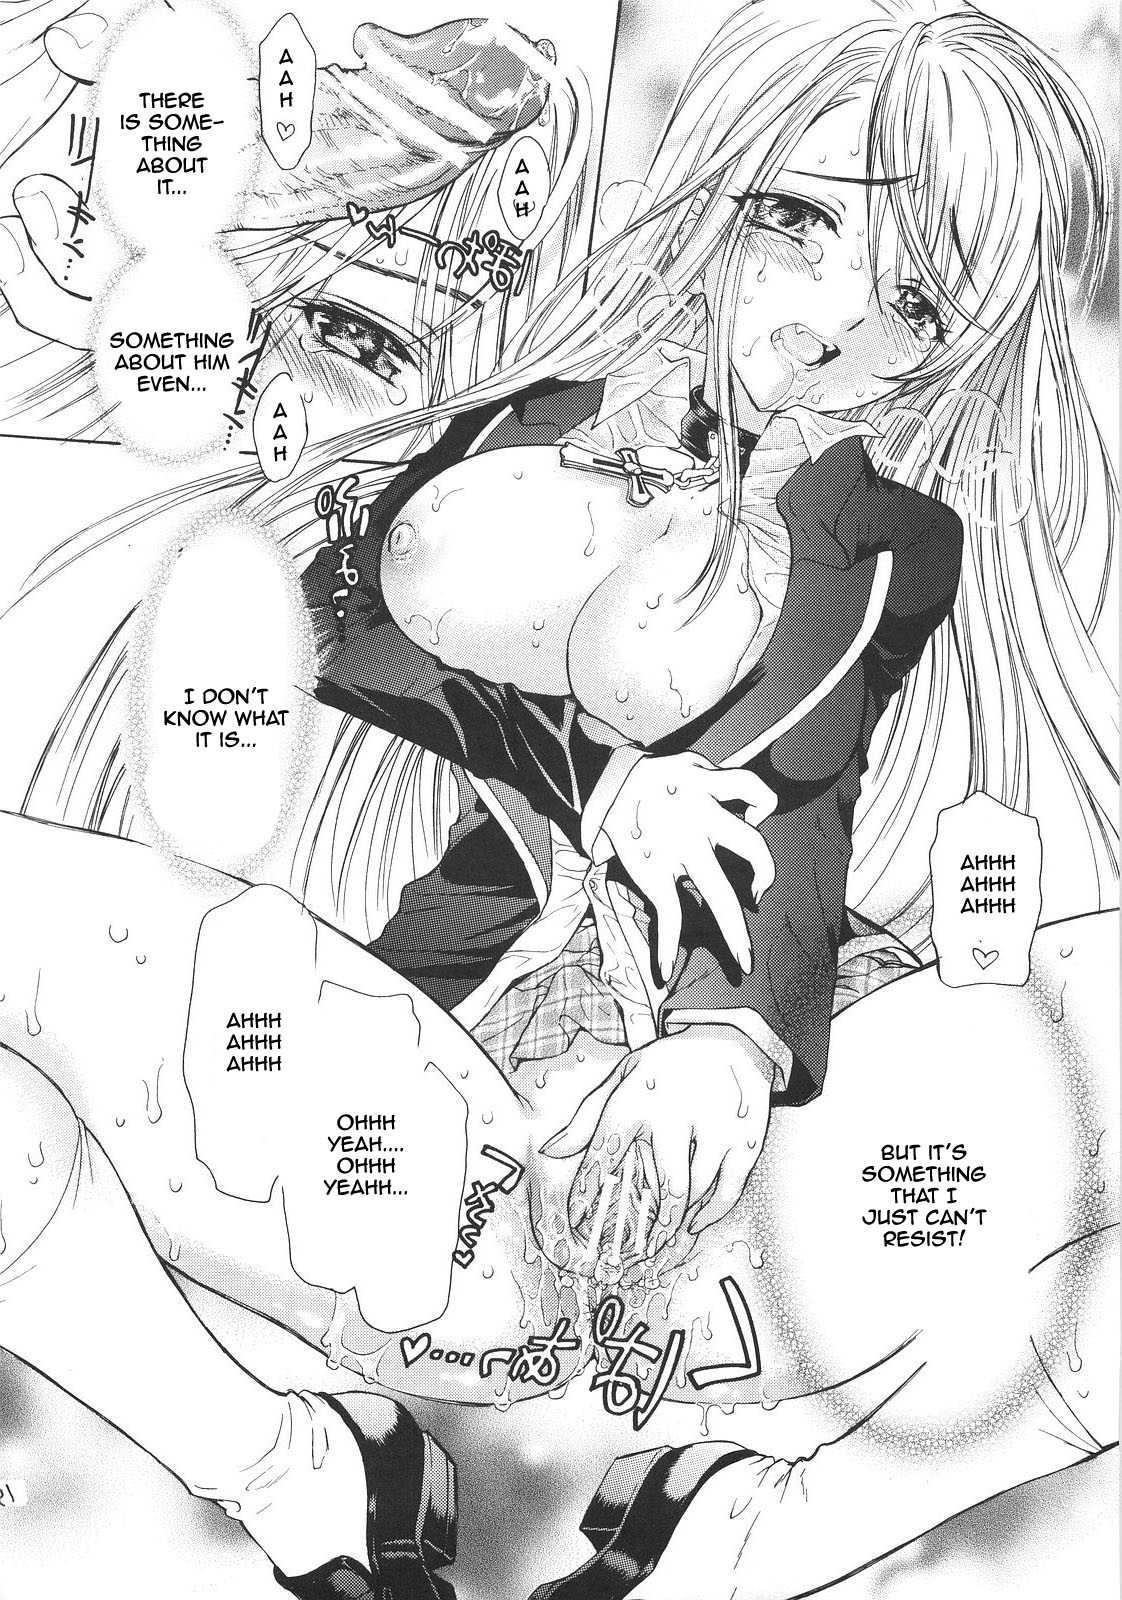 Manga hentai sex tapes vampires nude pink women